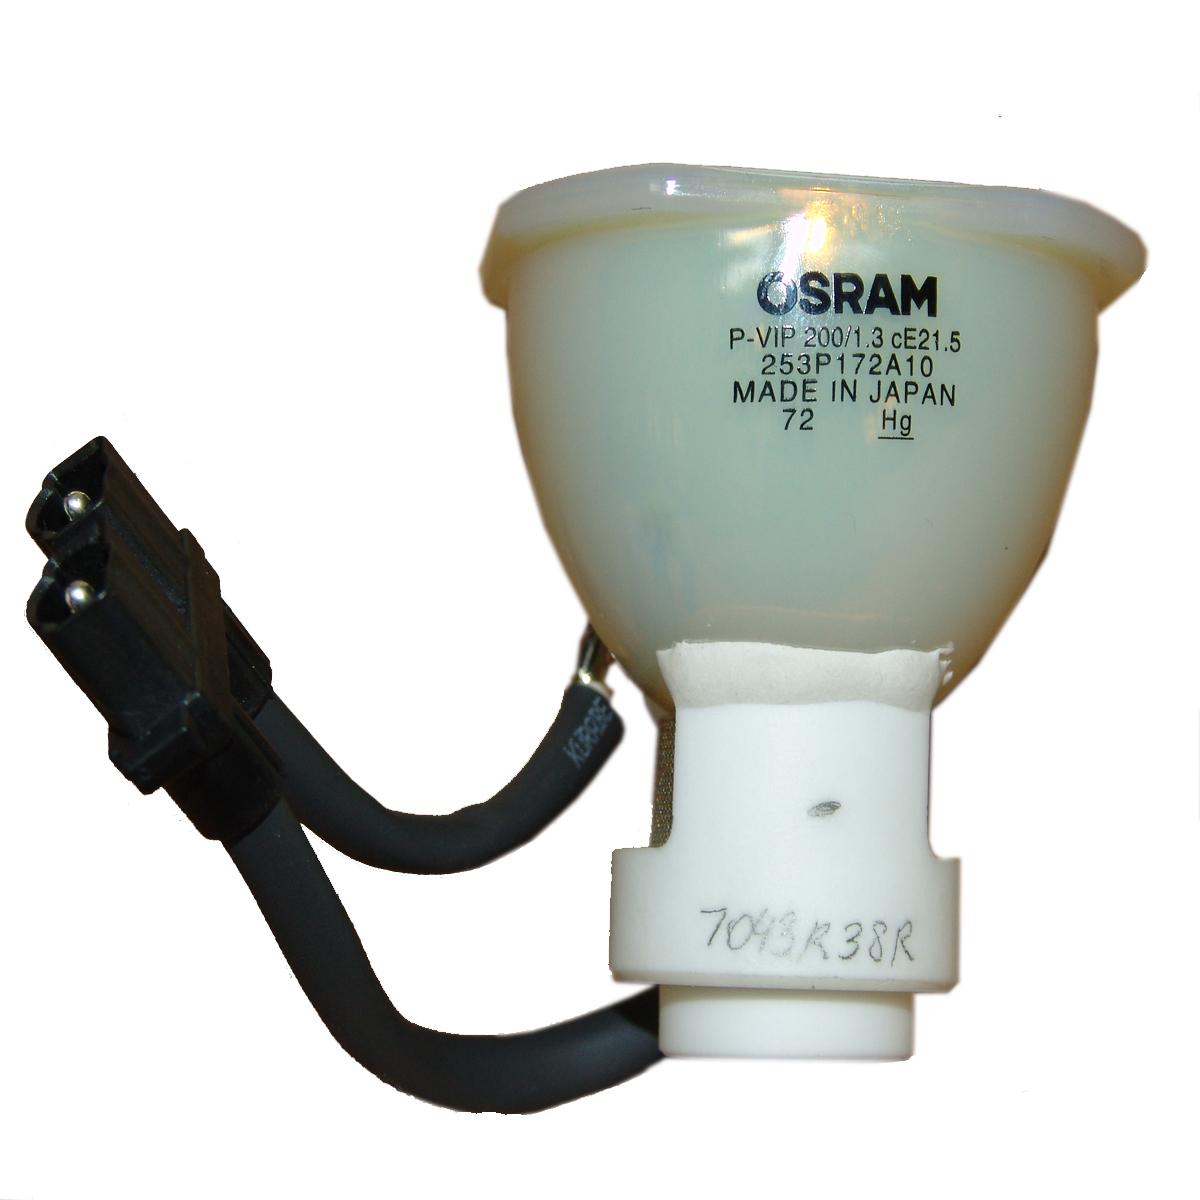 Original Osram Projector Lamp Replacement for Saville AV REPLMP123 (Bulb Only) - image 1 de 5